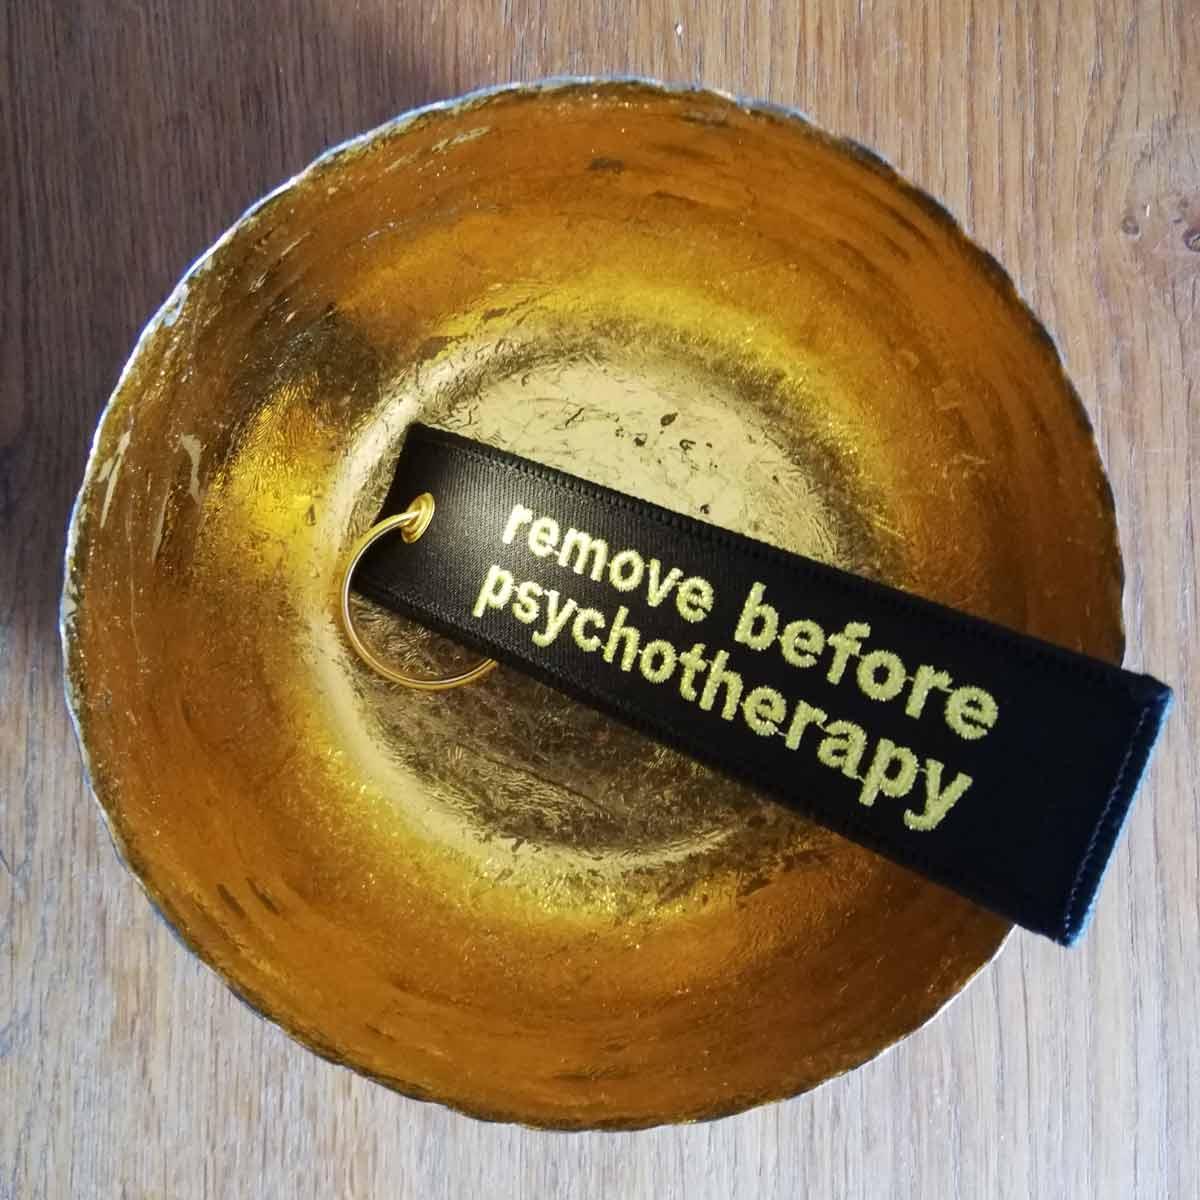 remove before psychotherapy 3monkeys schlüesselanhänger